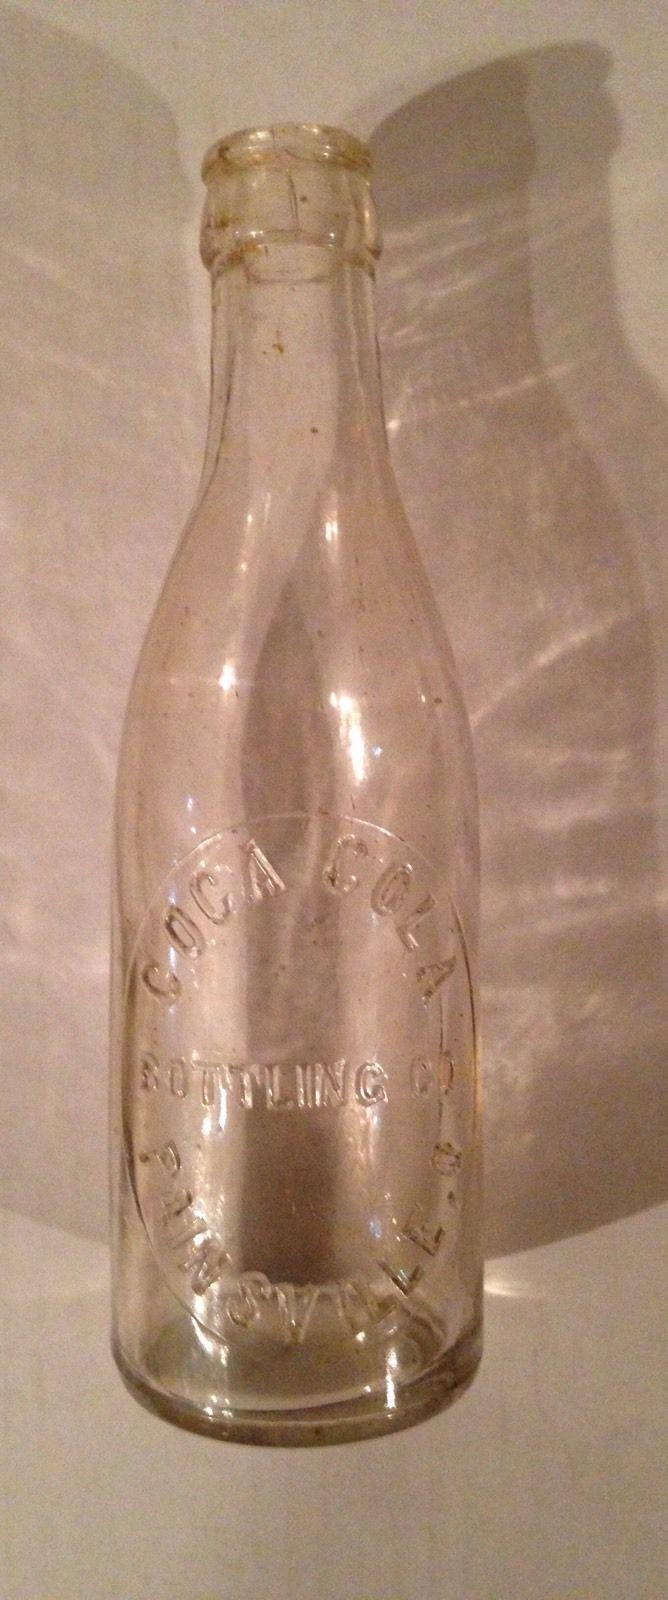 Antique Coca Cola Bottle Painsville Ohio - Pre 1905 (reduced)